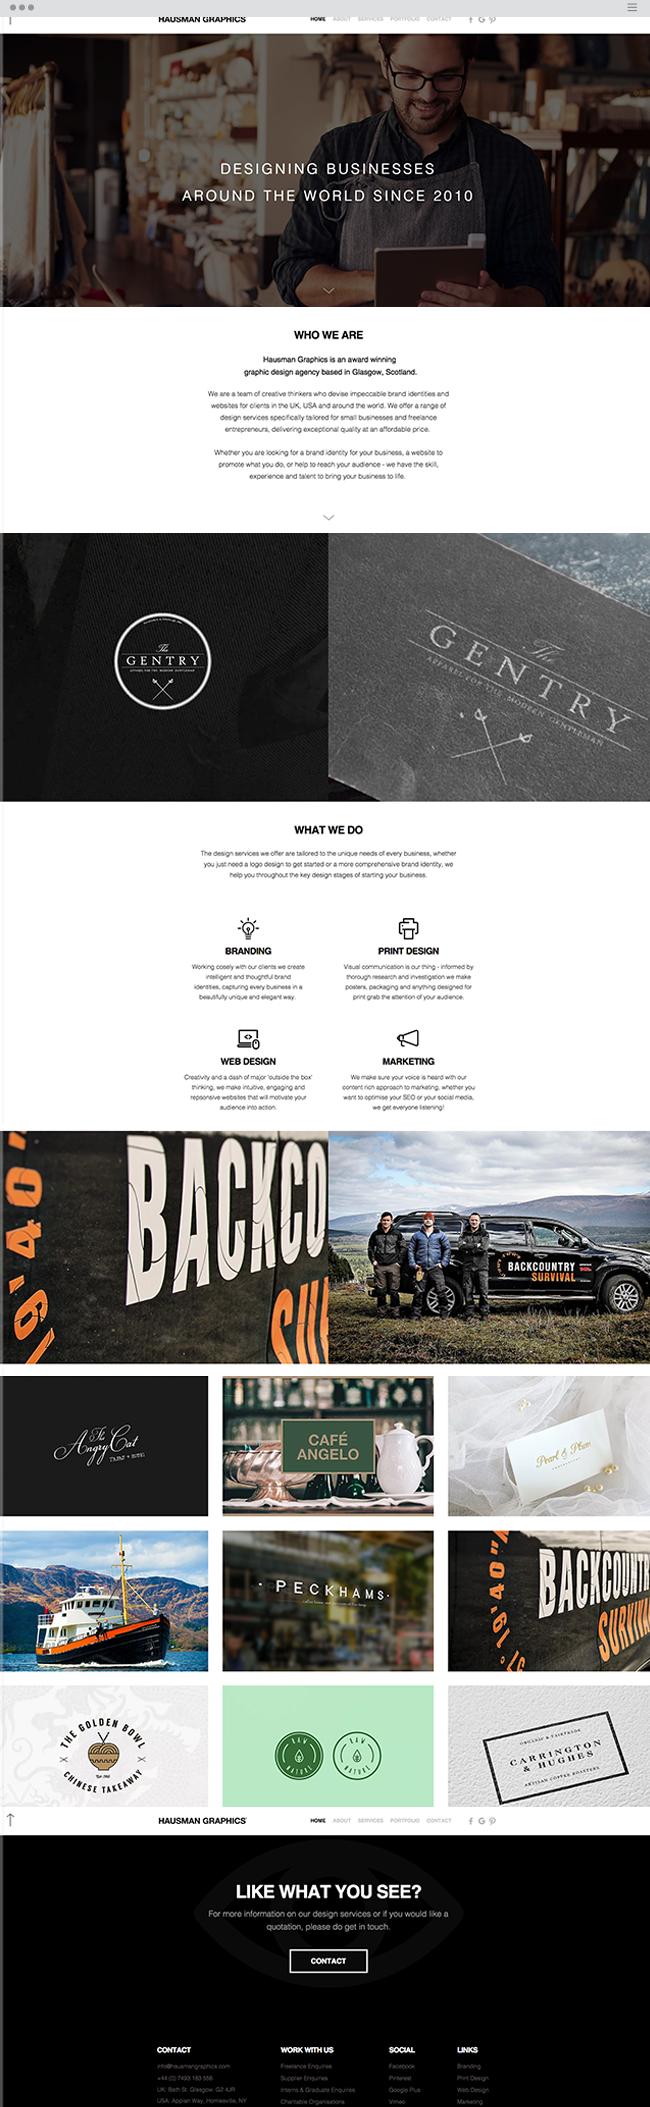 Hausman Graphics Graphic Design Agency Web Design Agency Wix Website Design Web Design